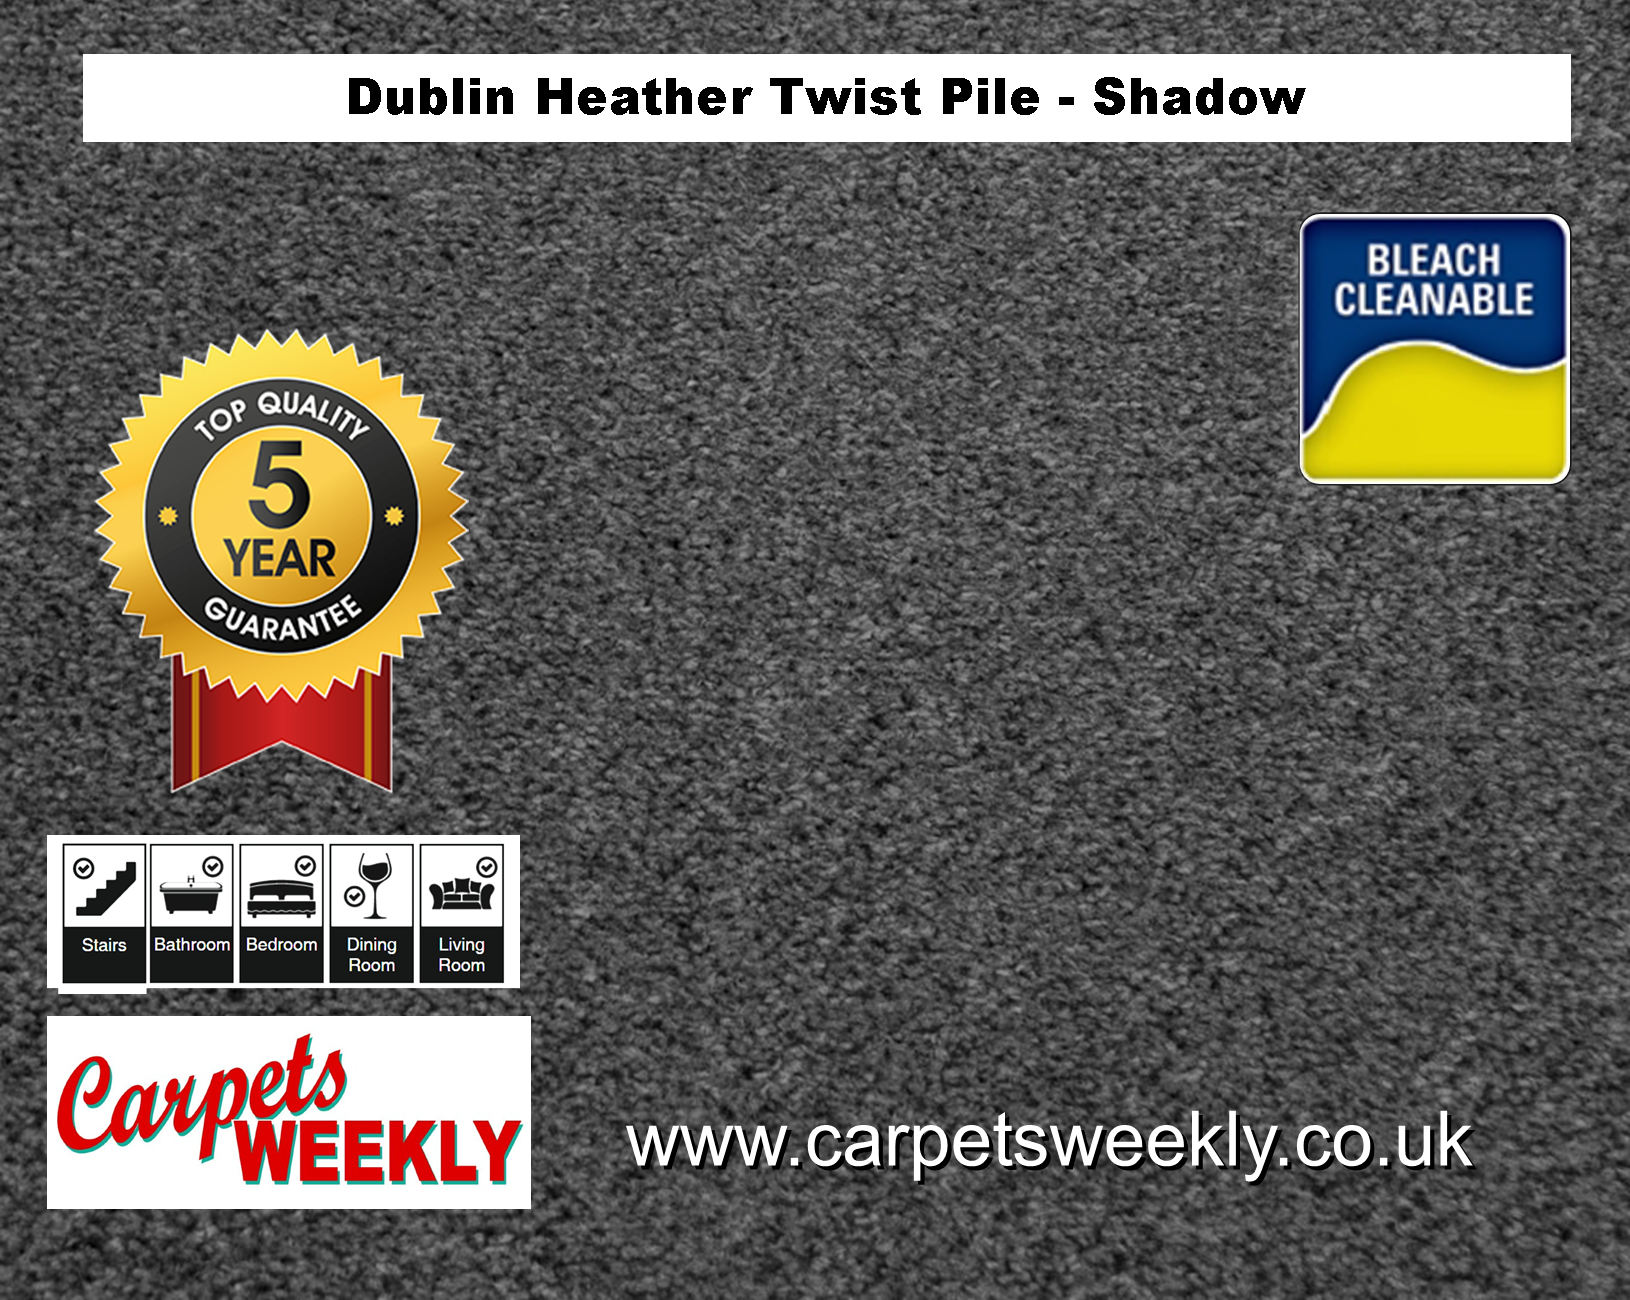 Carpets Weekly Dublin Heather Shadow - 162 mid range carpet